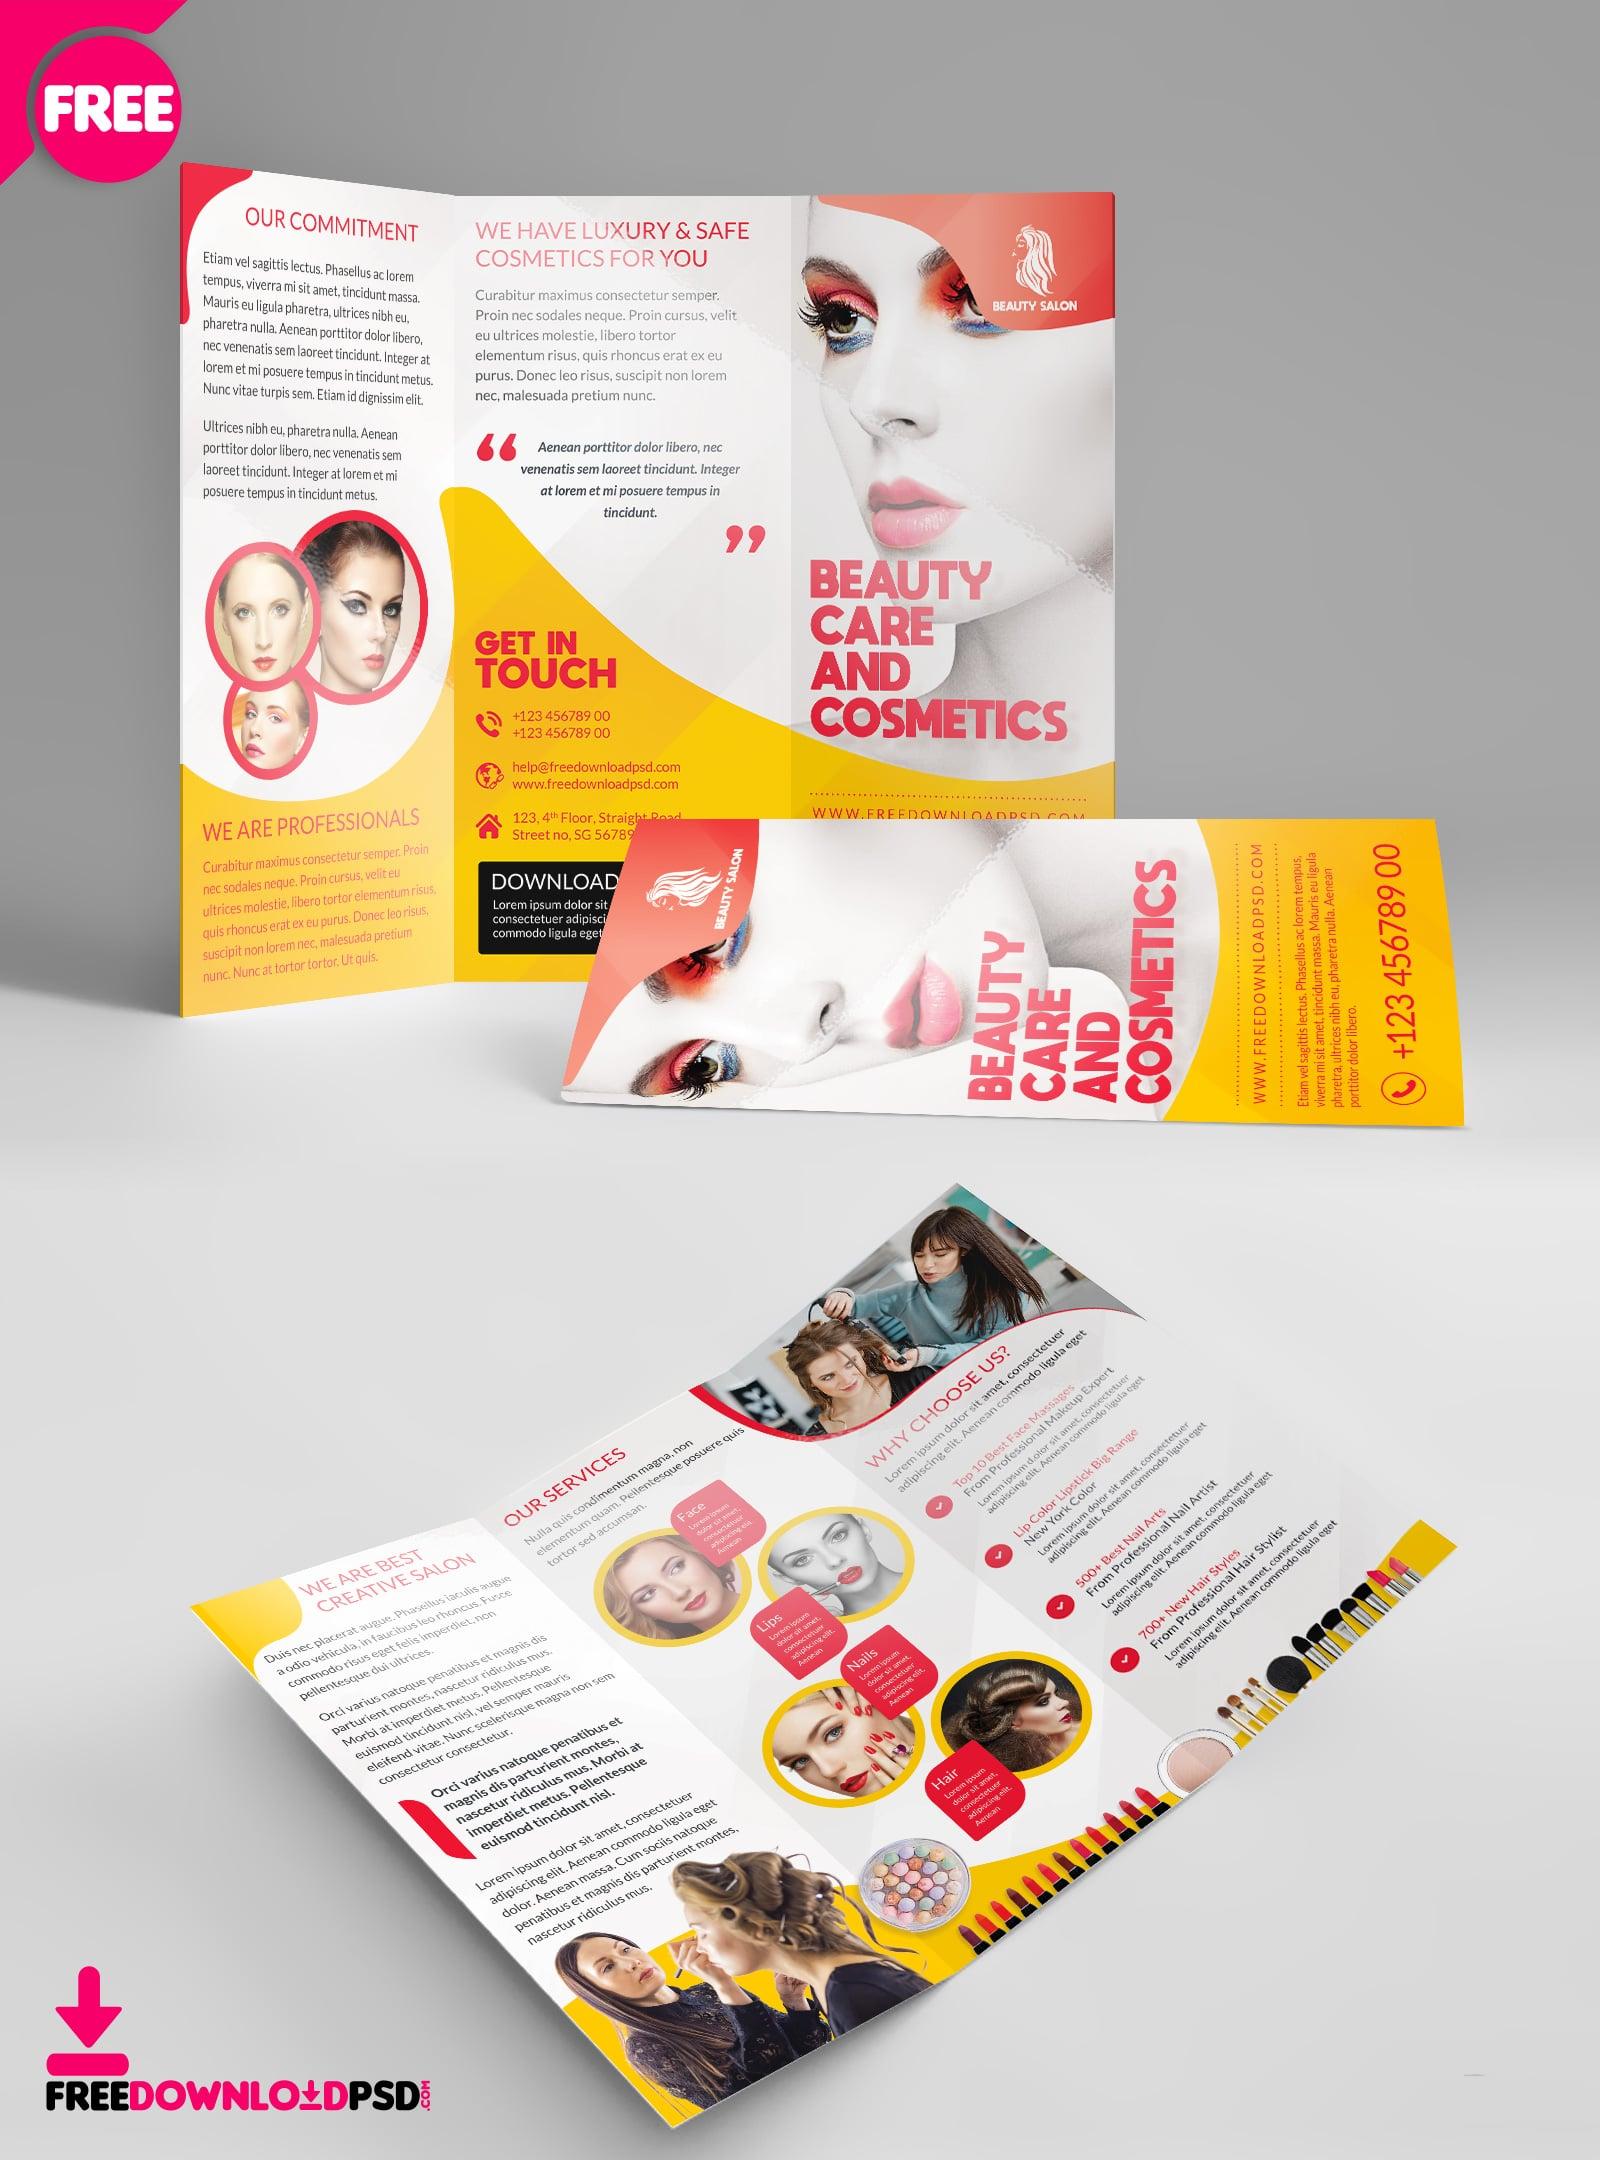 PSD Brochure Mockup Free Download